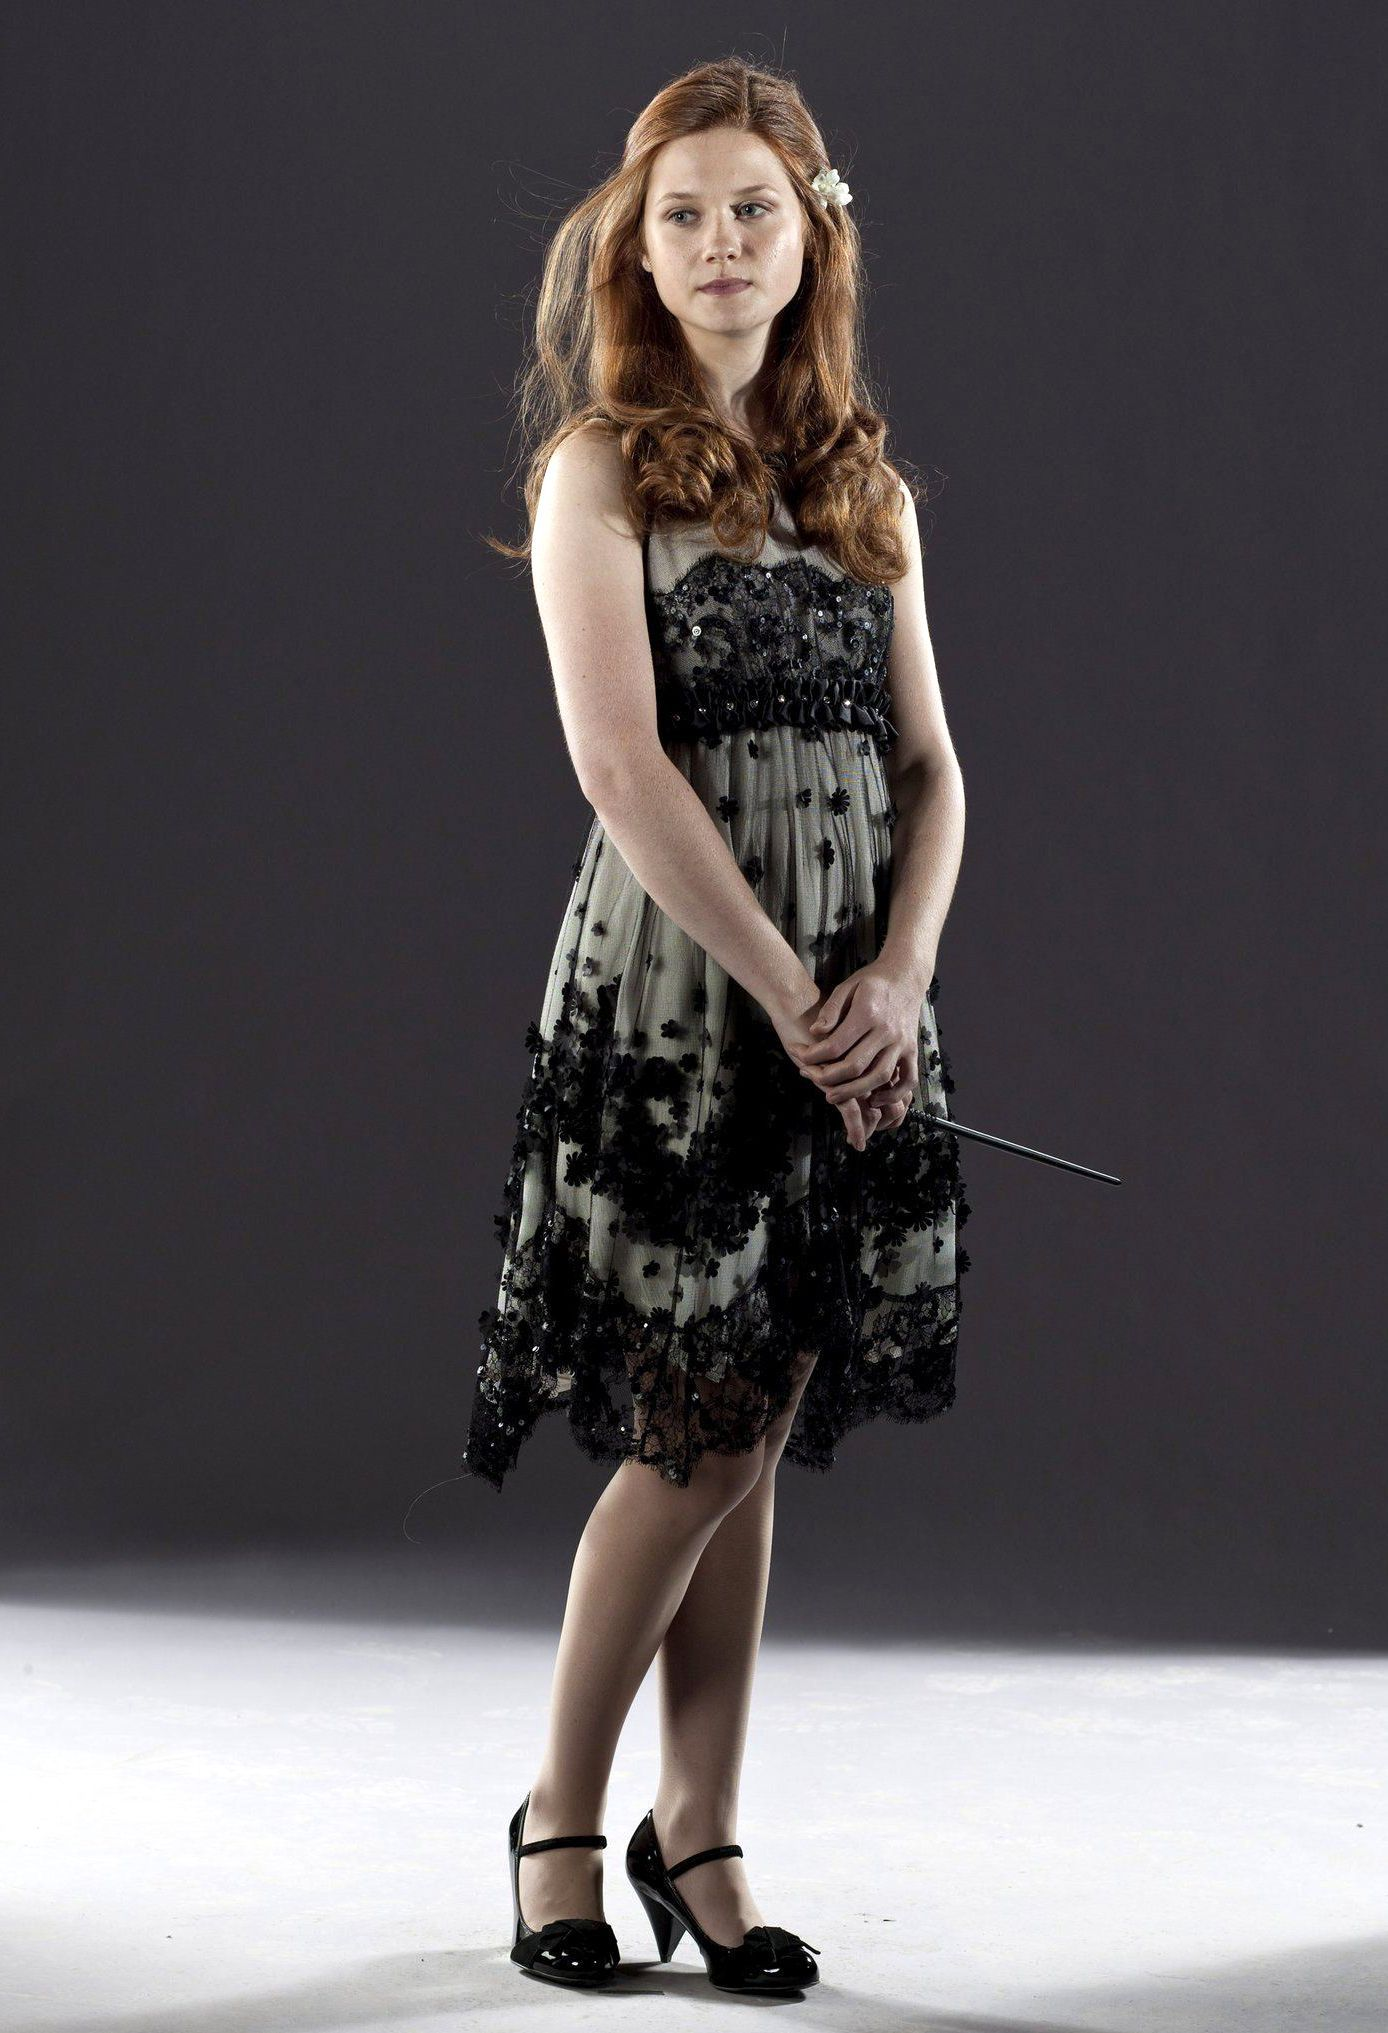 20 Harry Potter Halloween Costumes Ginny Weasley 1 Bonnie Wright Harry Potter Film Harry Potter Halloween Kostume